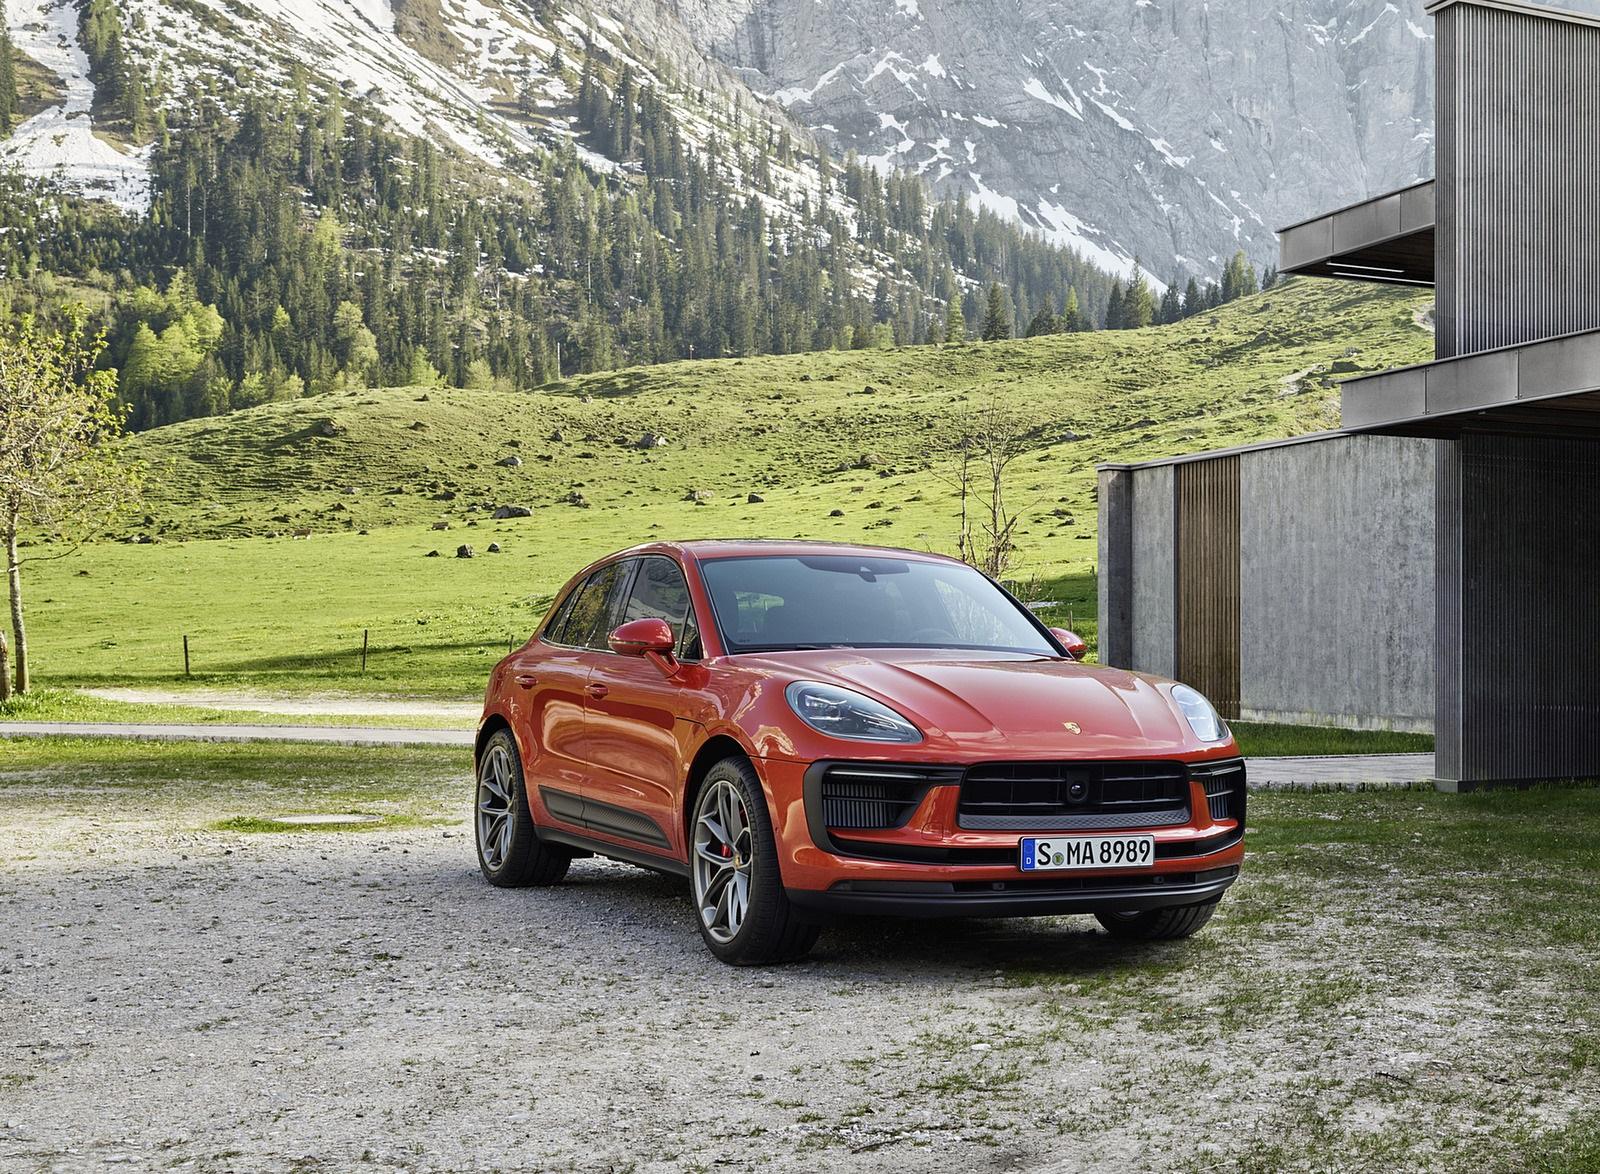 2022 Porsche Macan S Front Three-Quarter Wallpapers (7)